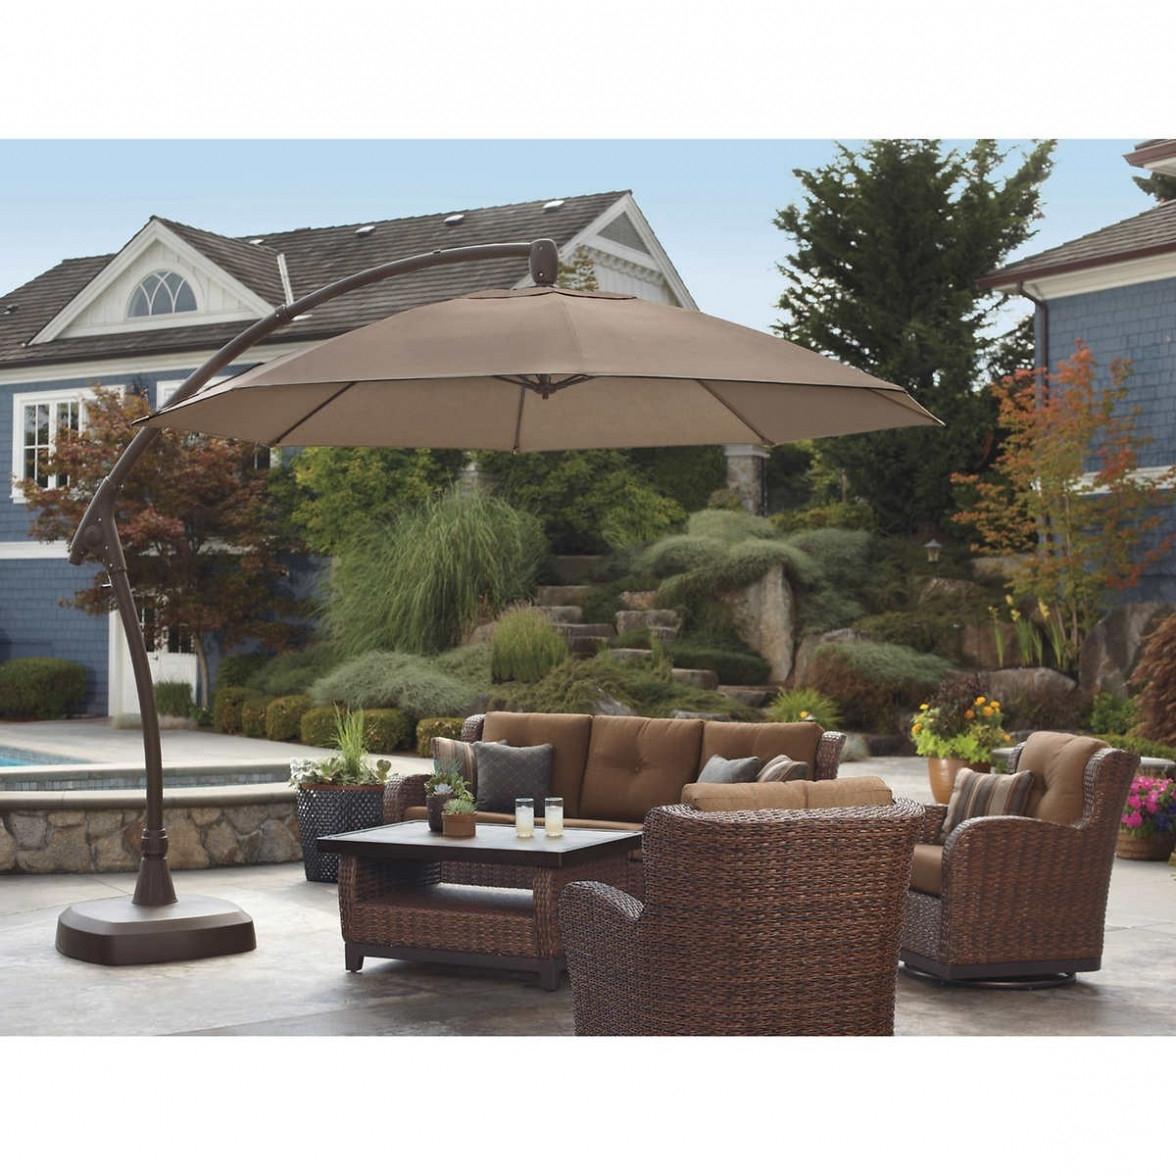 Costco Patio Umbrellas For Current Costco Patio Umbrella – Home Design Ideas (View 2 of 20)